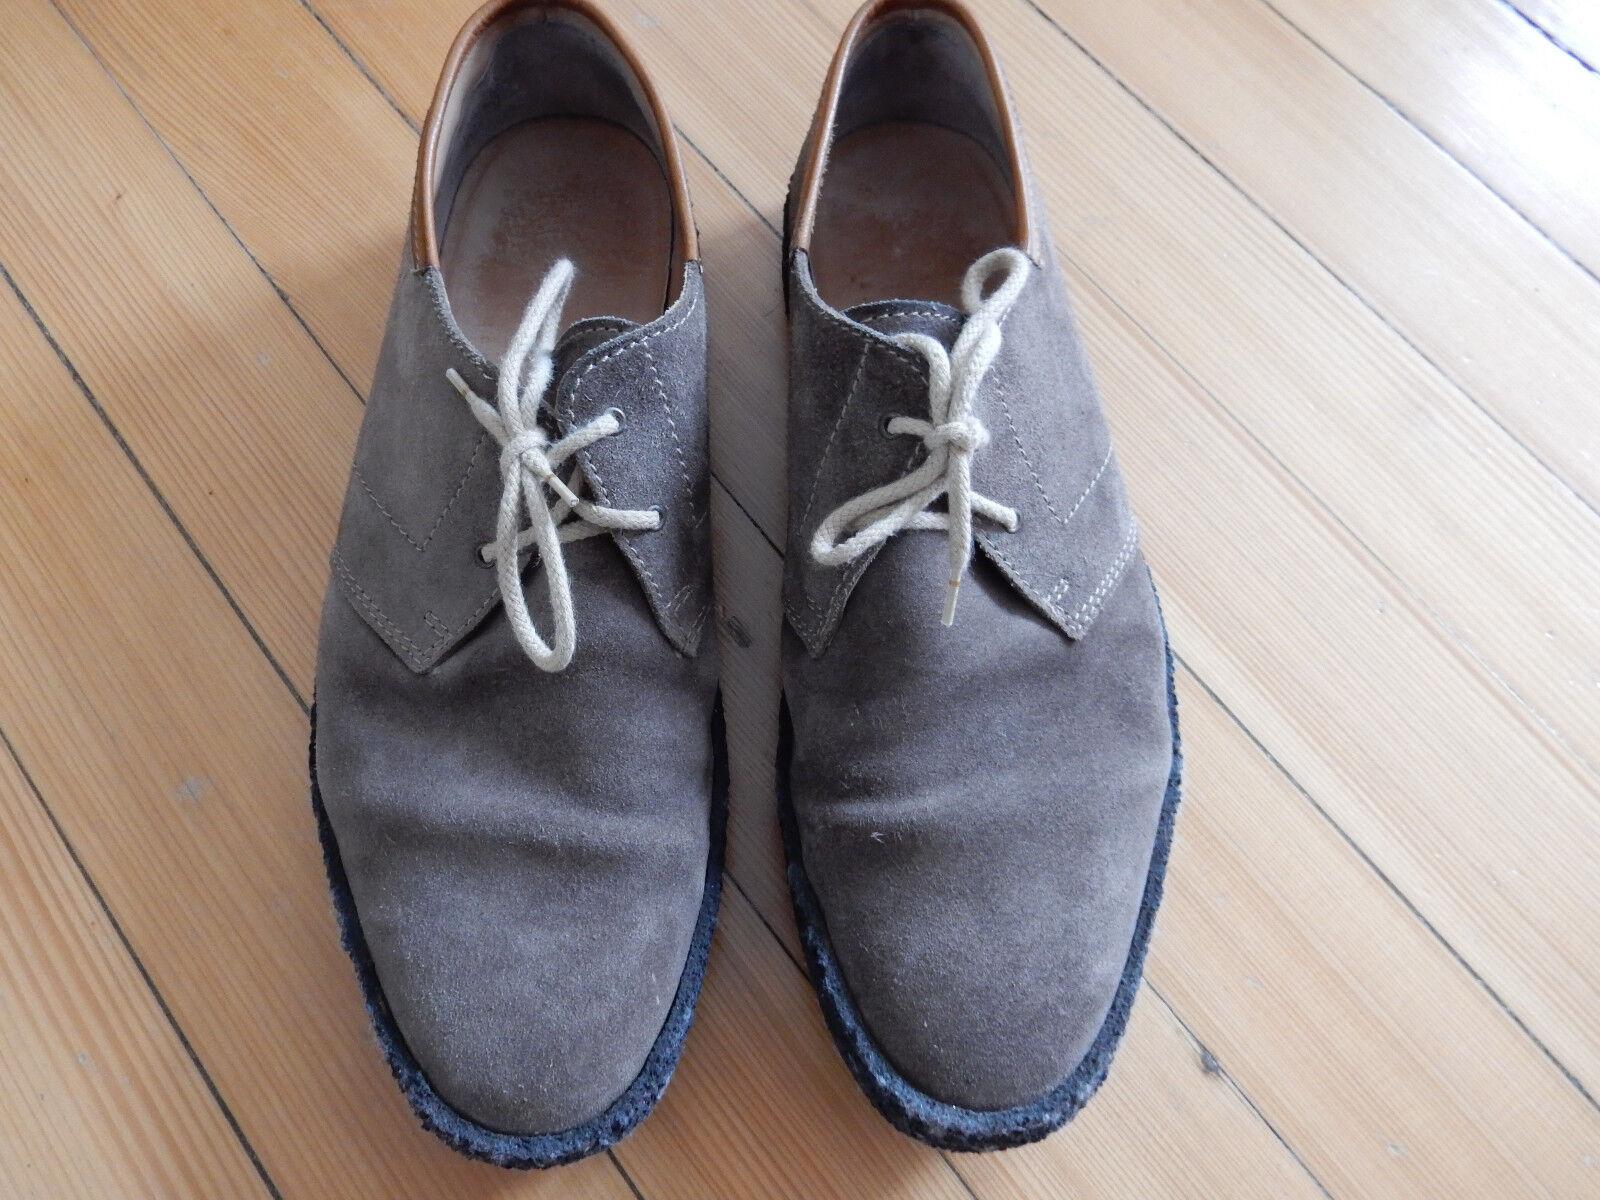 Northern cobbler # @ England # schöne Halbschuhe # 45 # cobbler Wildleder Natur Kreppsohle a204f2